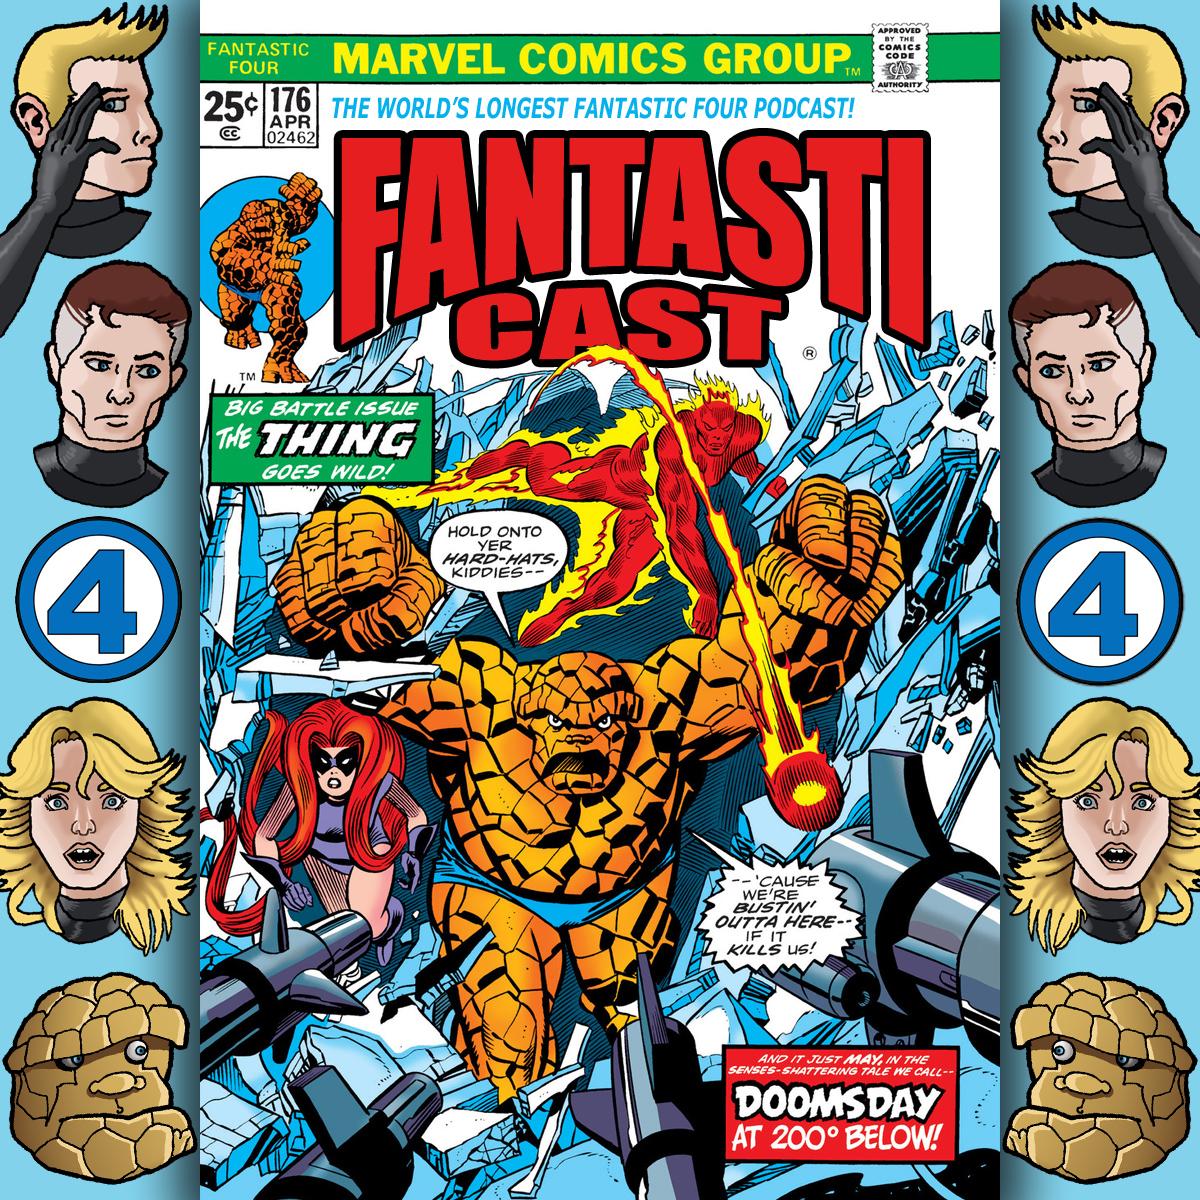 Episode 176: Fantastic Four #146 - Doomsday: 200 Degrees Below